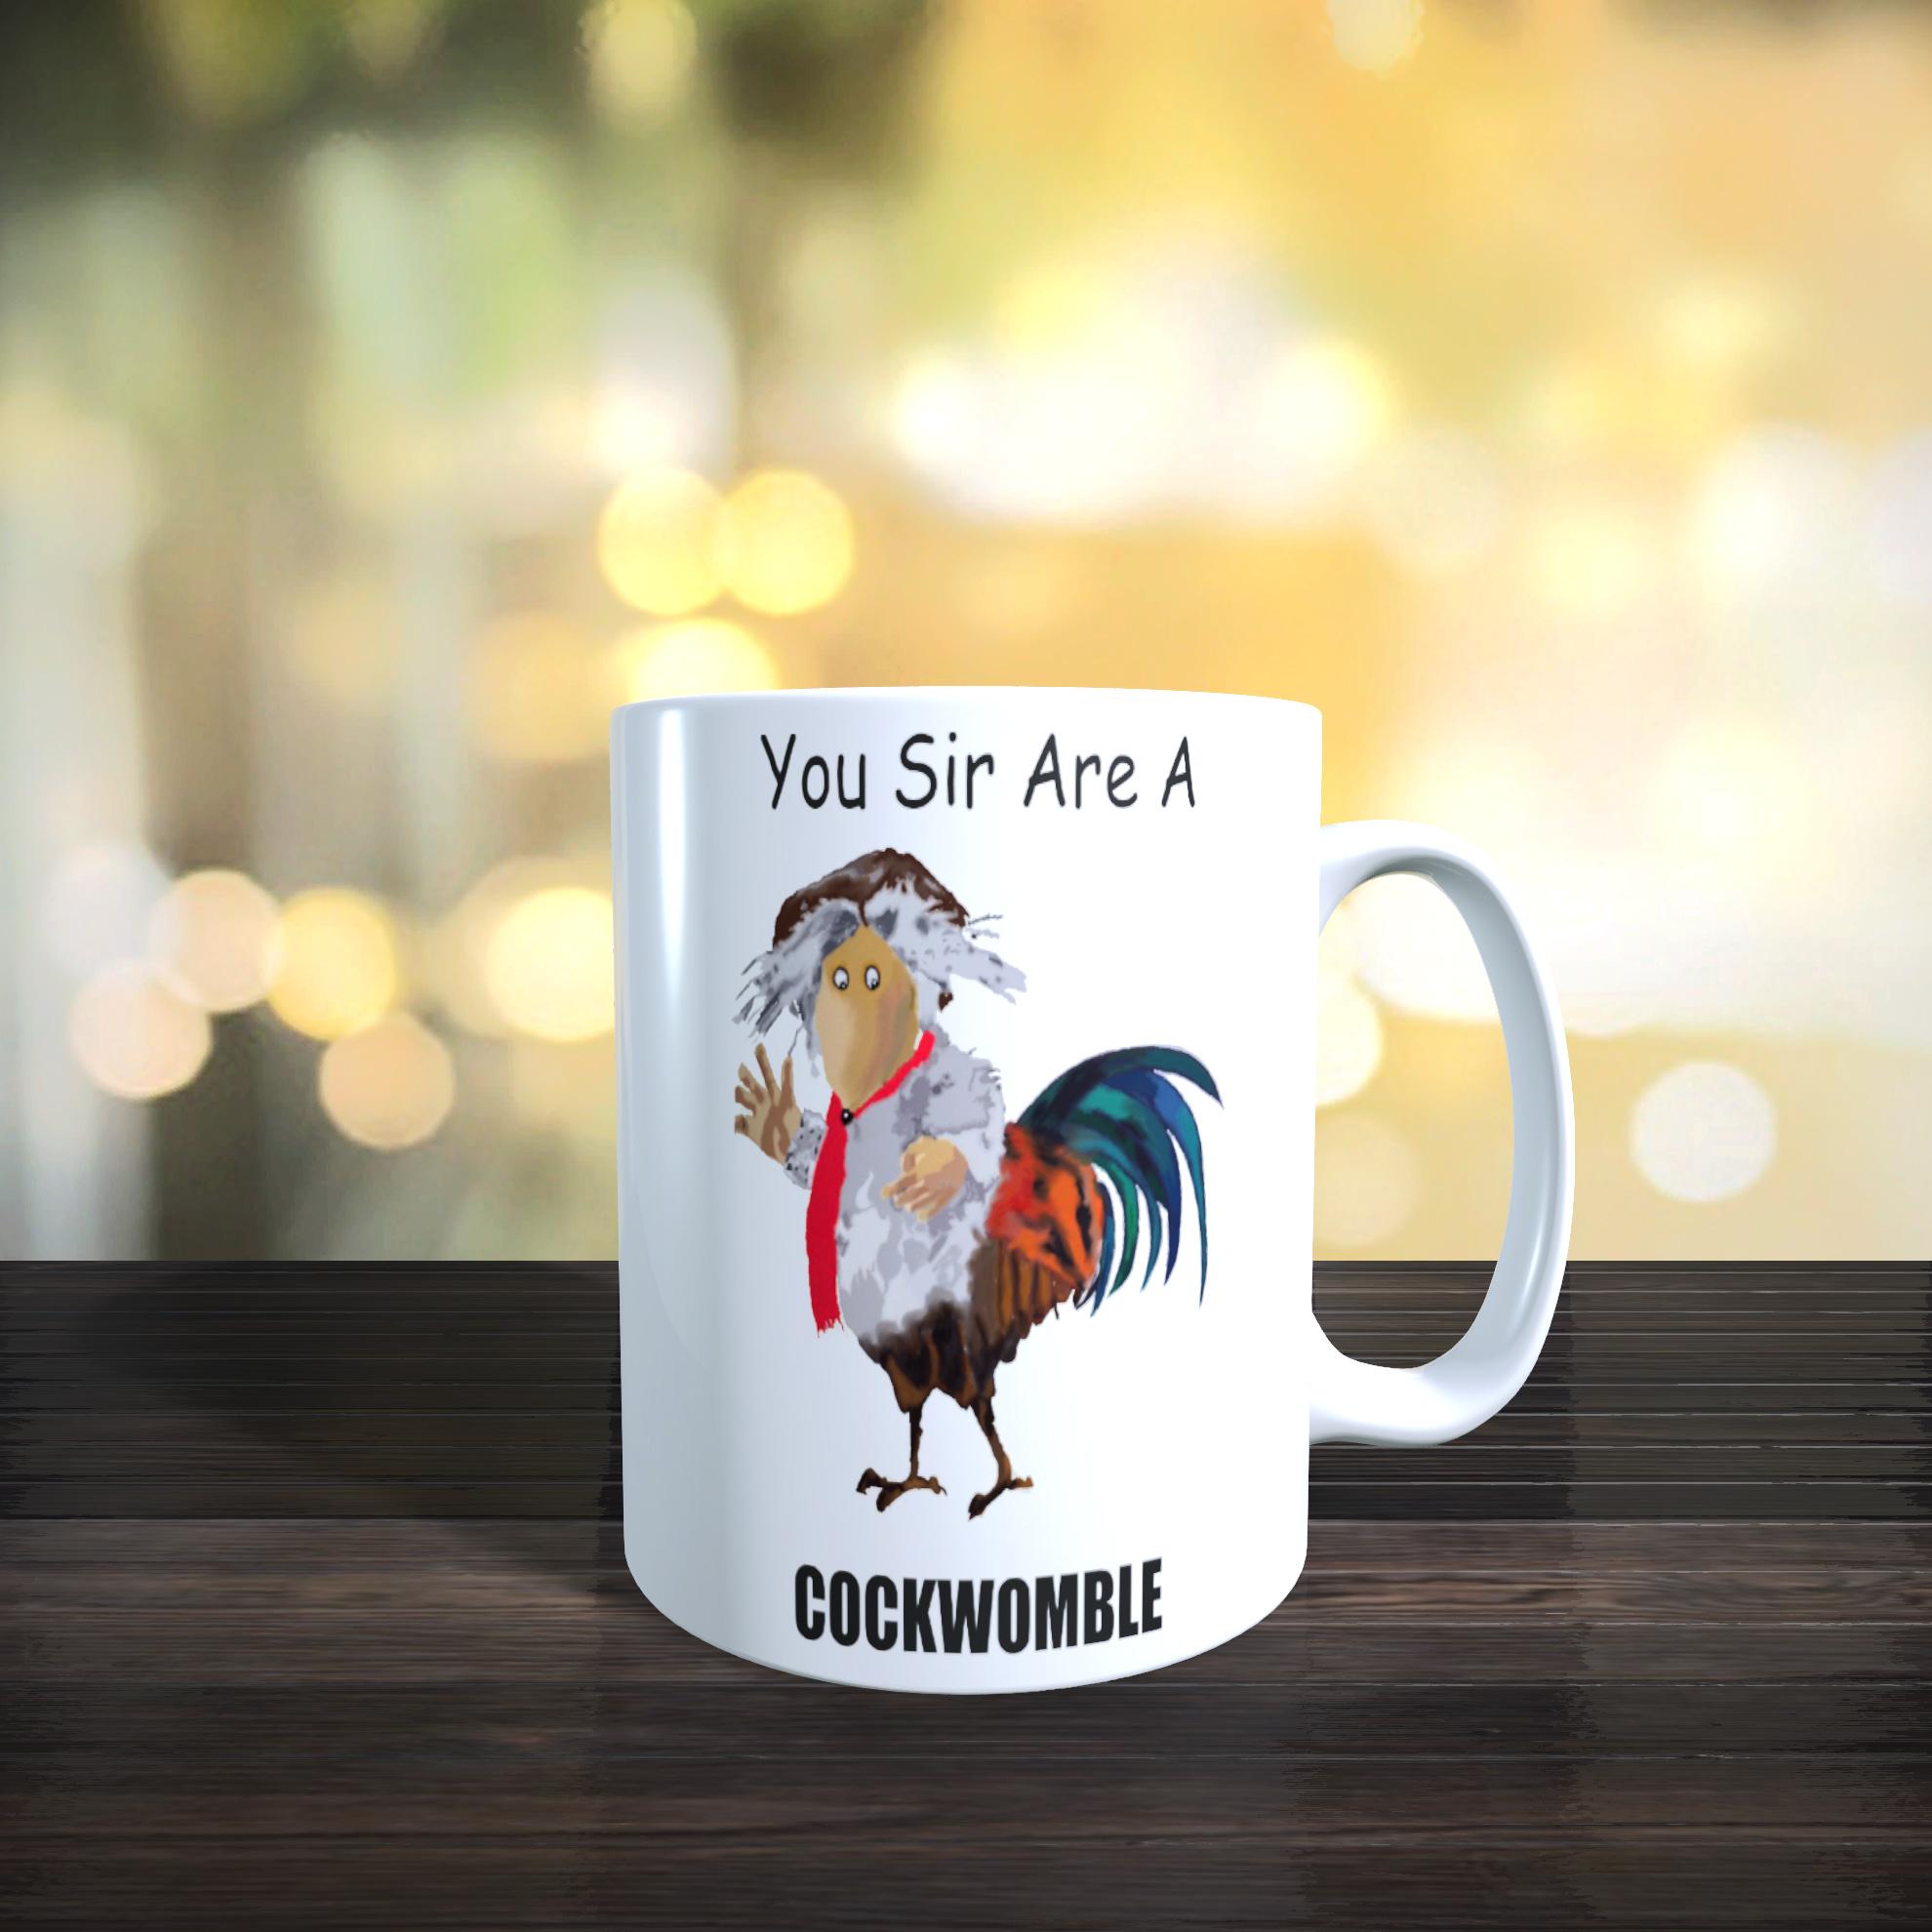 You Sir Are A Cockwomble Ceramic Mug